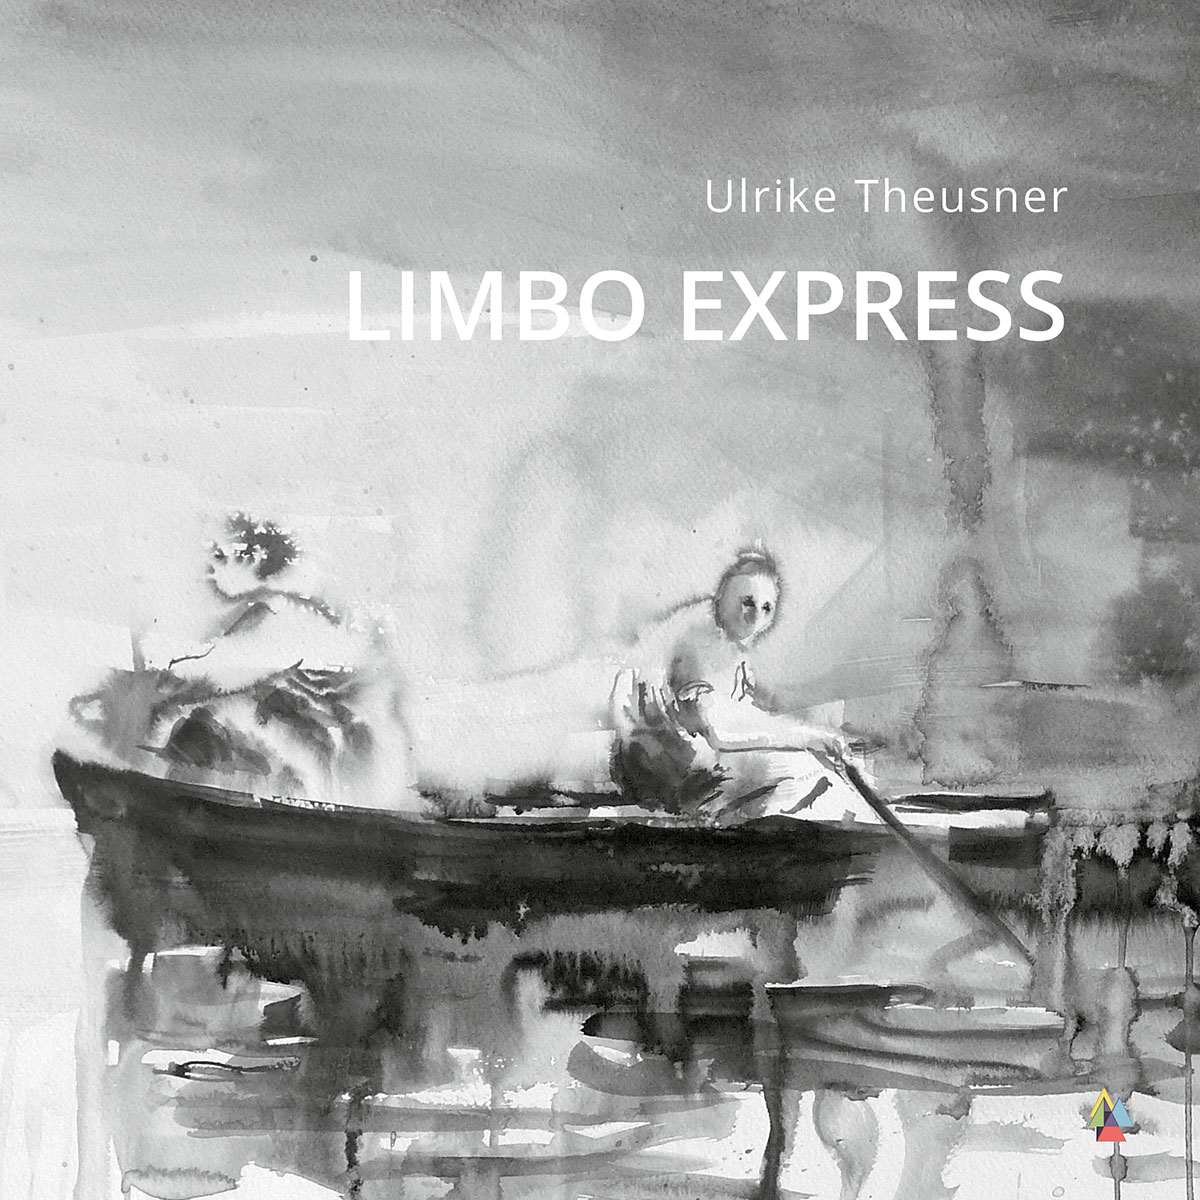 Ulrike Theusner Limbo Express 978-3-945482-84-1 Broschüre Jalara Verlag